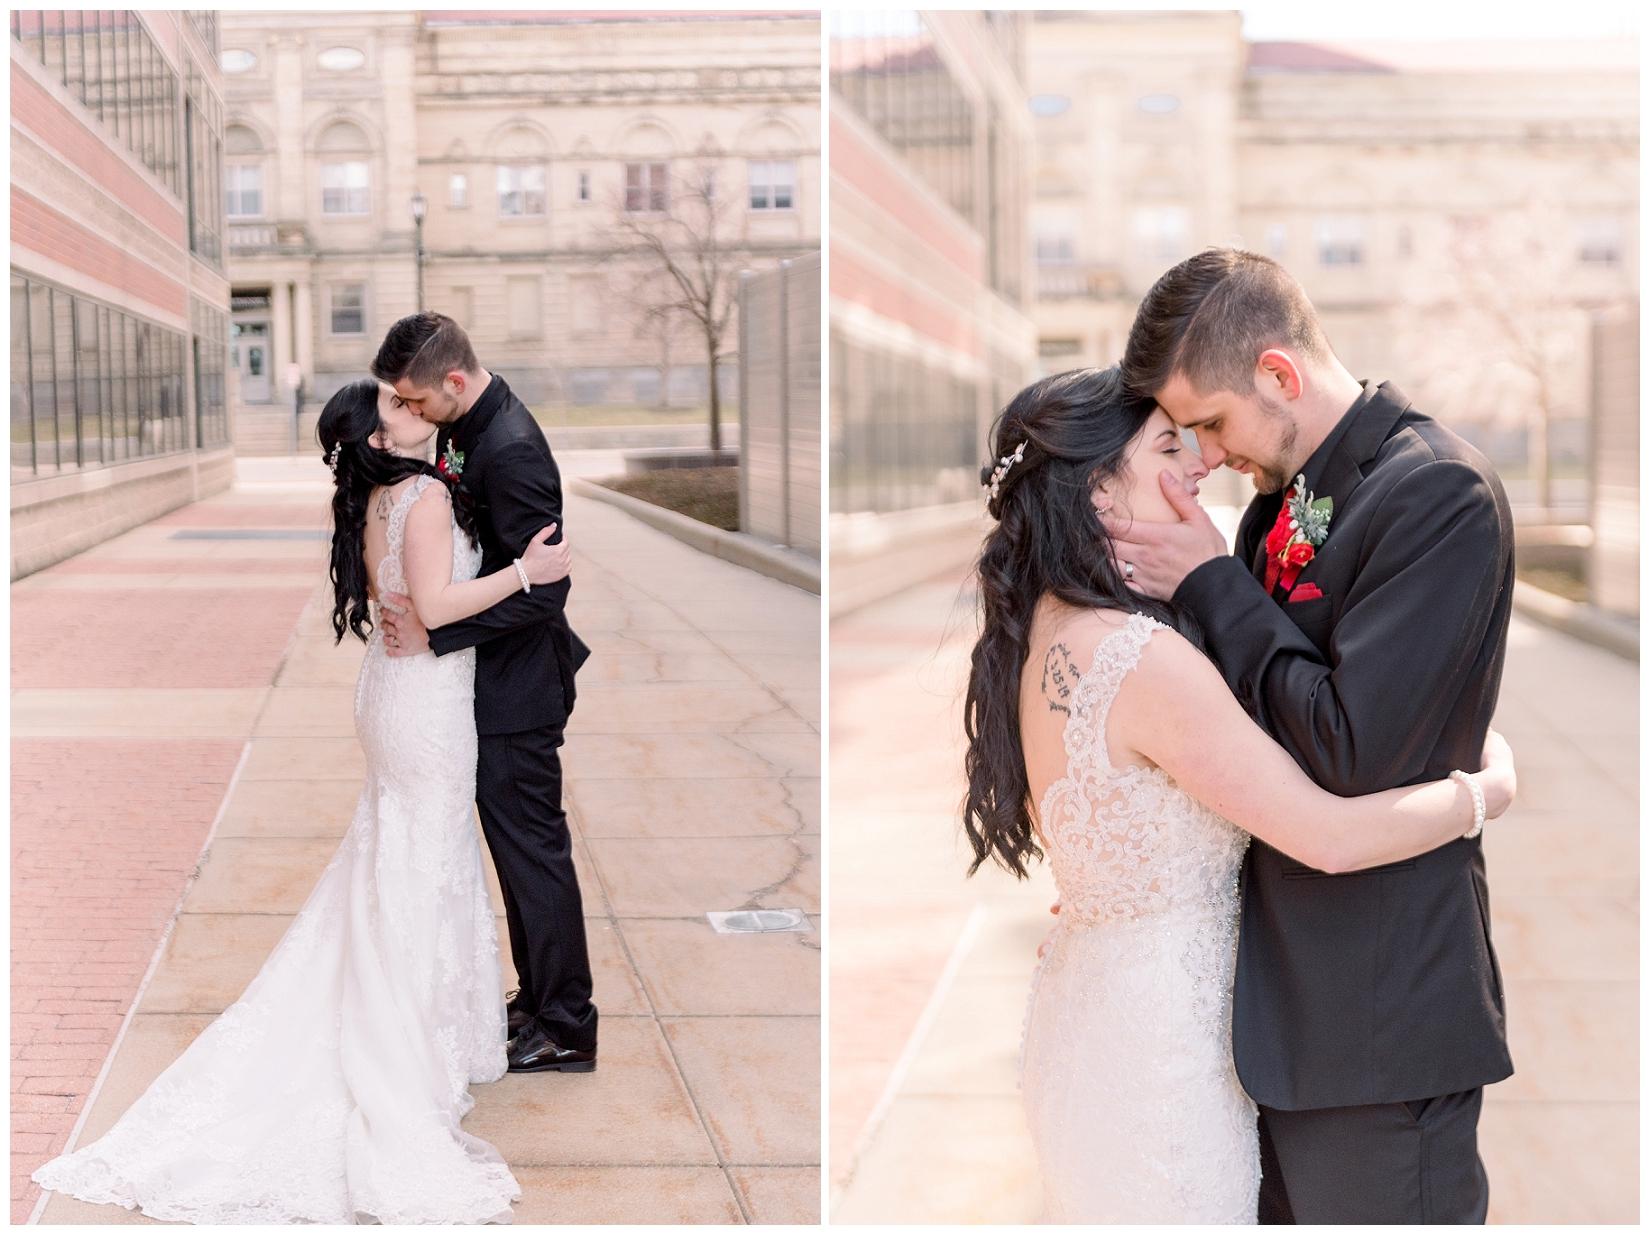 cat-alkire-wedding-photographer-indiana-chicago-indianapolis-fort-wayne_1113.jpg